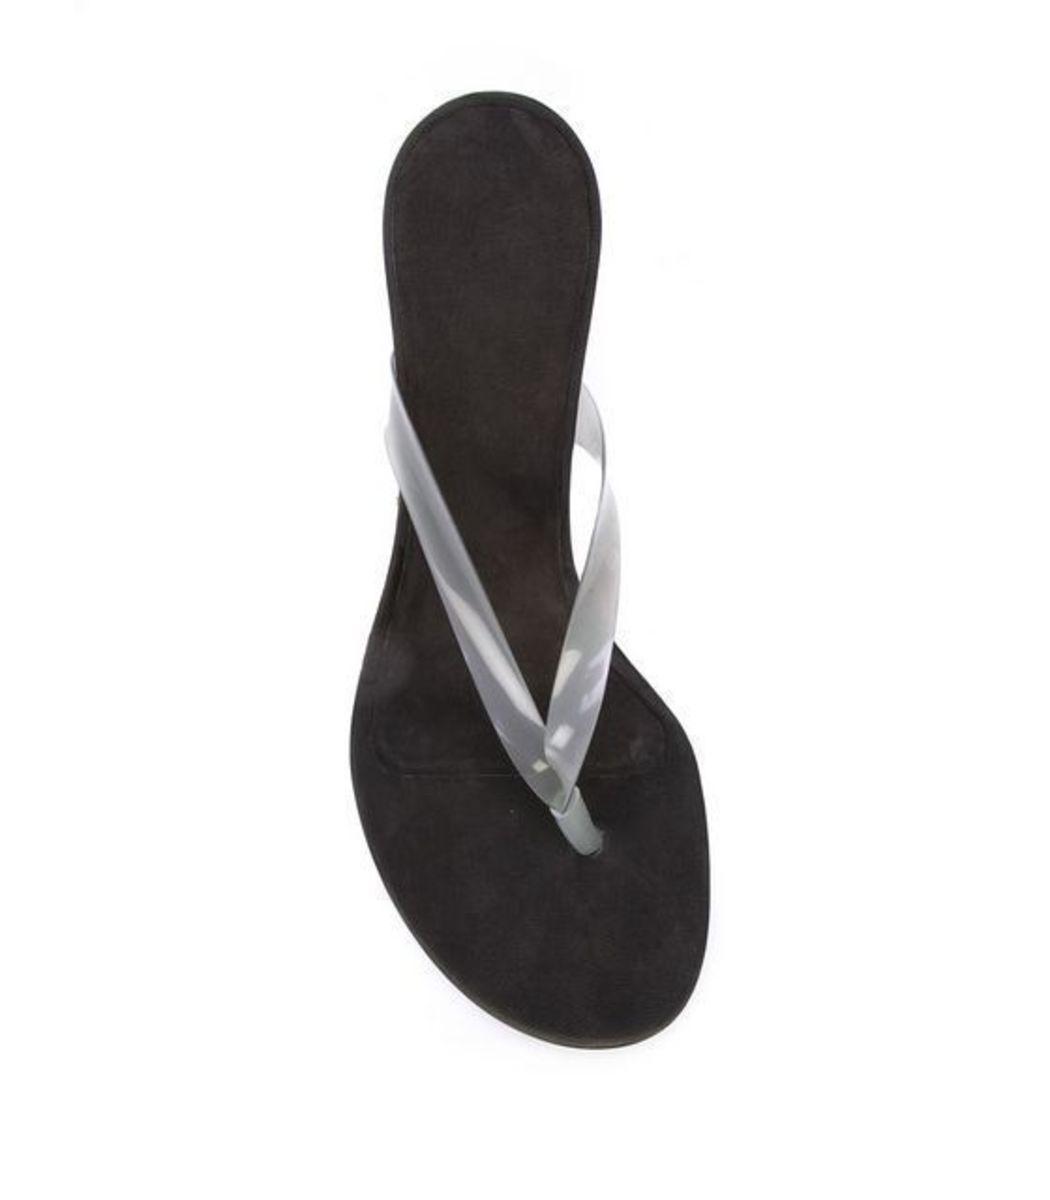 67722dd50 YEEZY PVC Wedge Thong Sandal - ShopBAZAAR